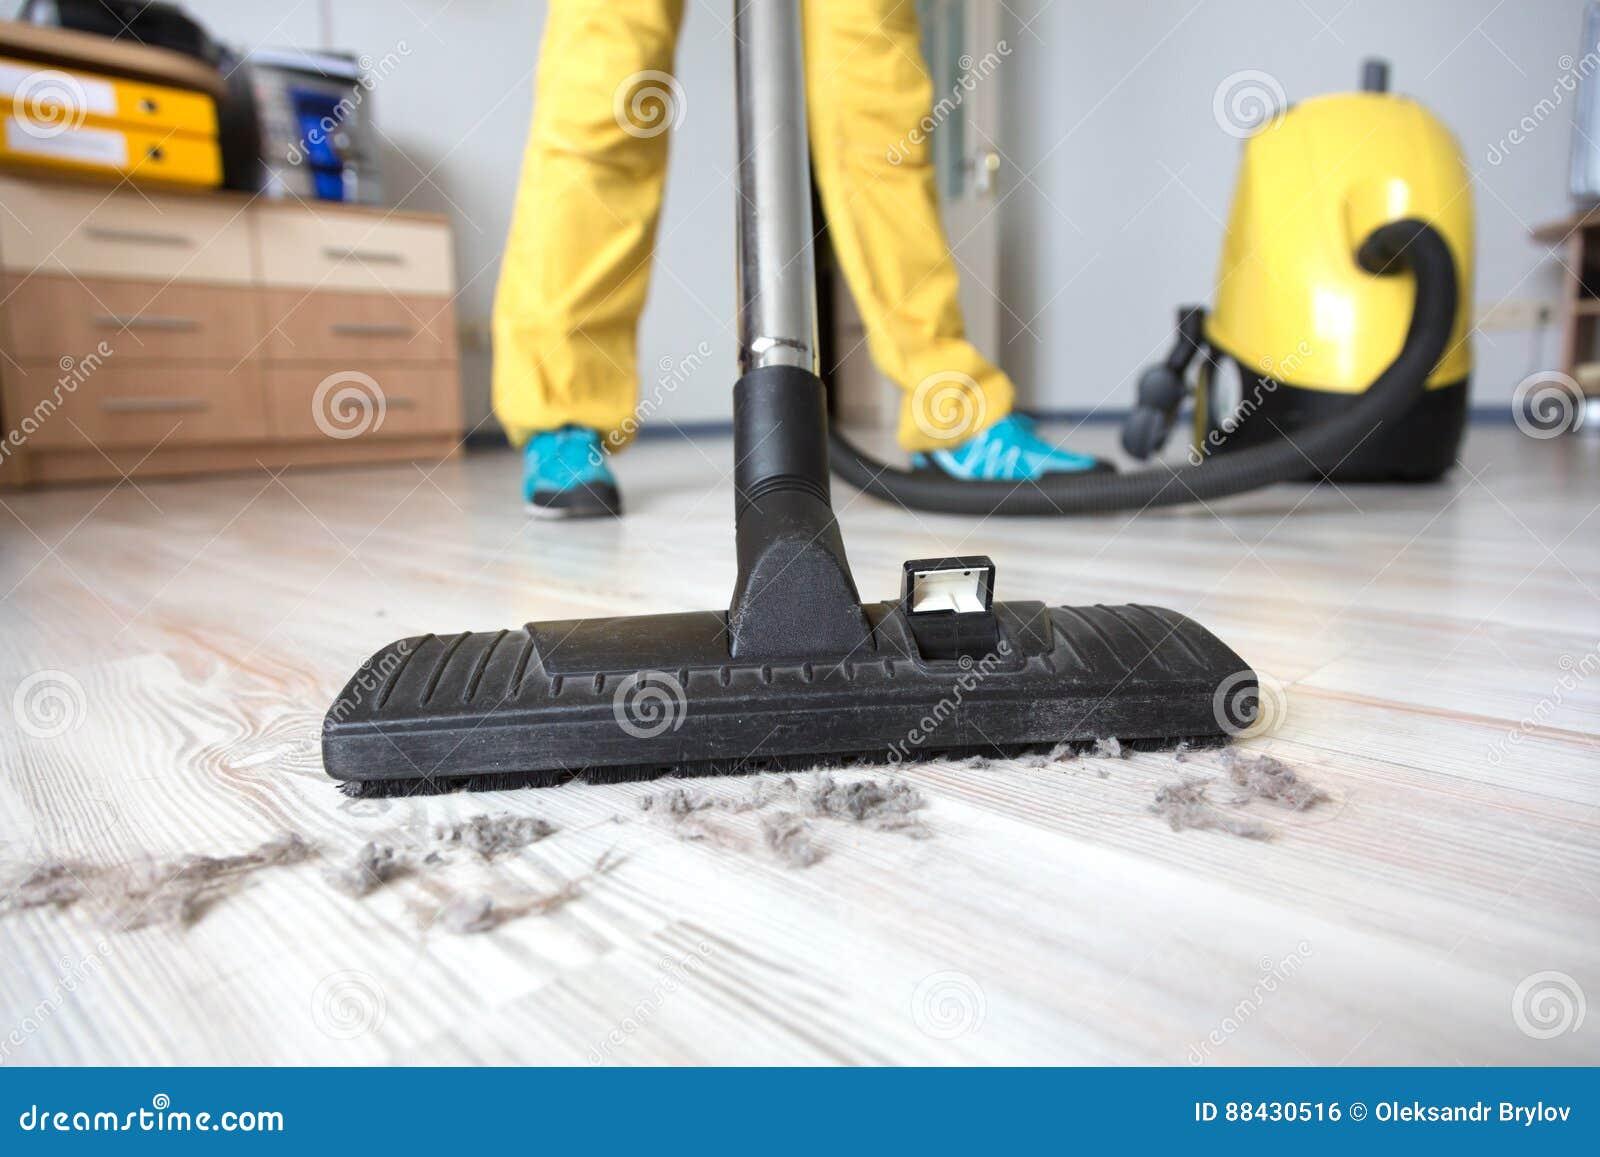 e464c02a7ff4 Πρόσωπο που καθαρίζει το ξύλινο πάτωμα με την ηλεκτρική σκούπα Στοκ ...